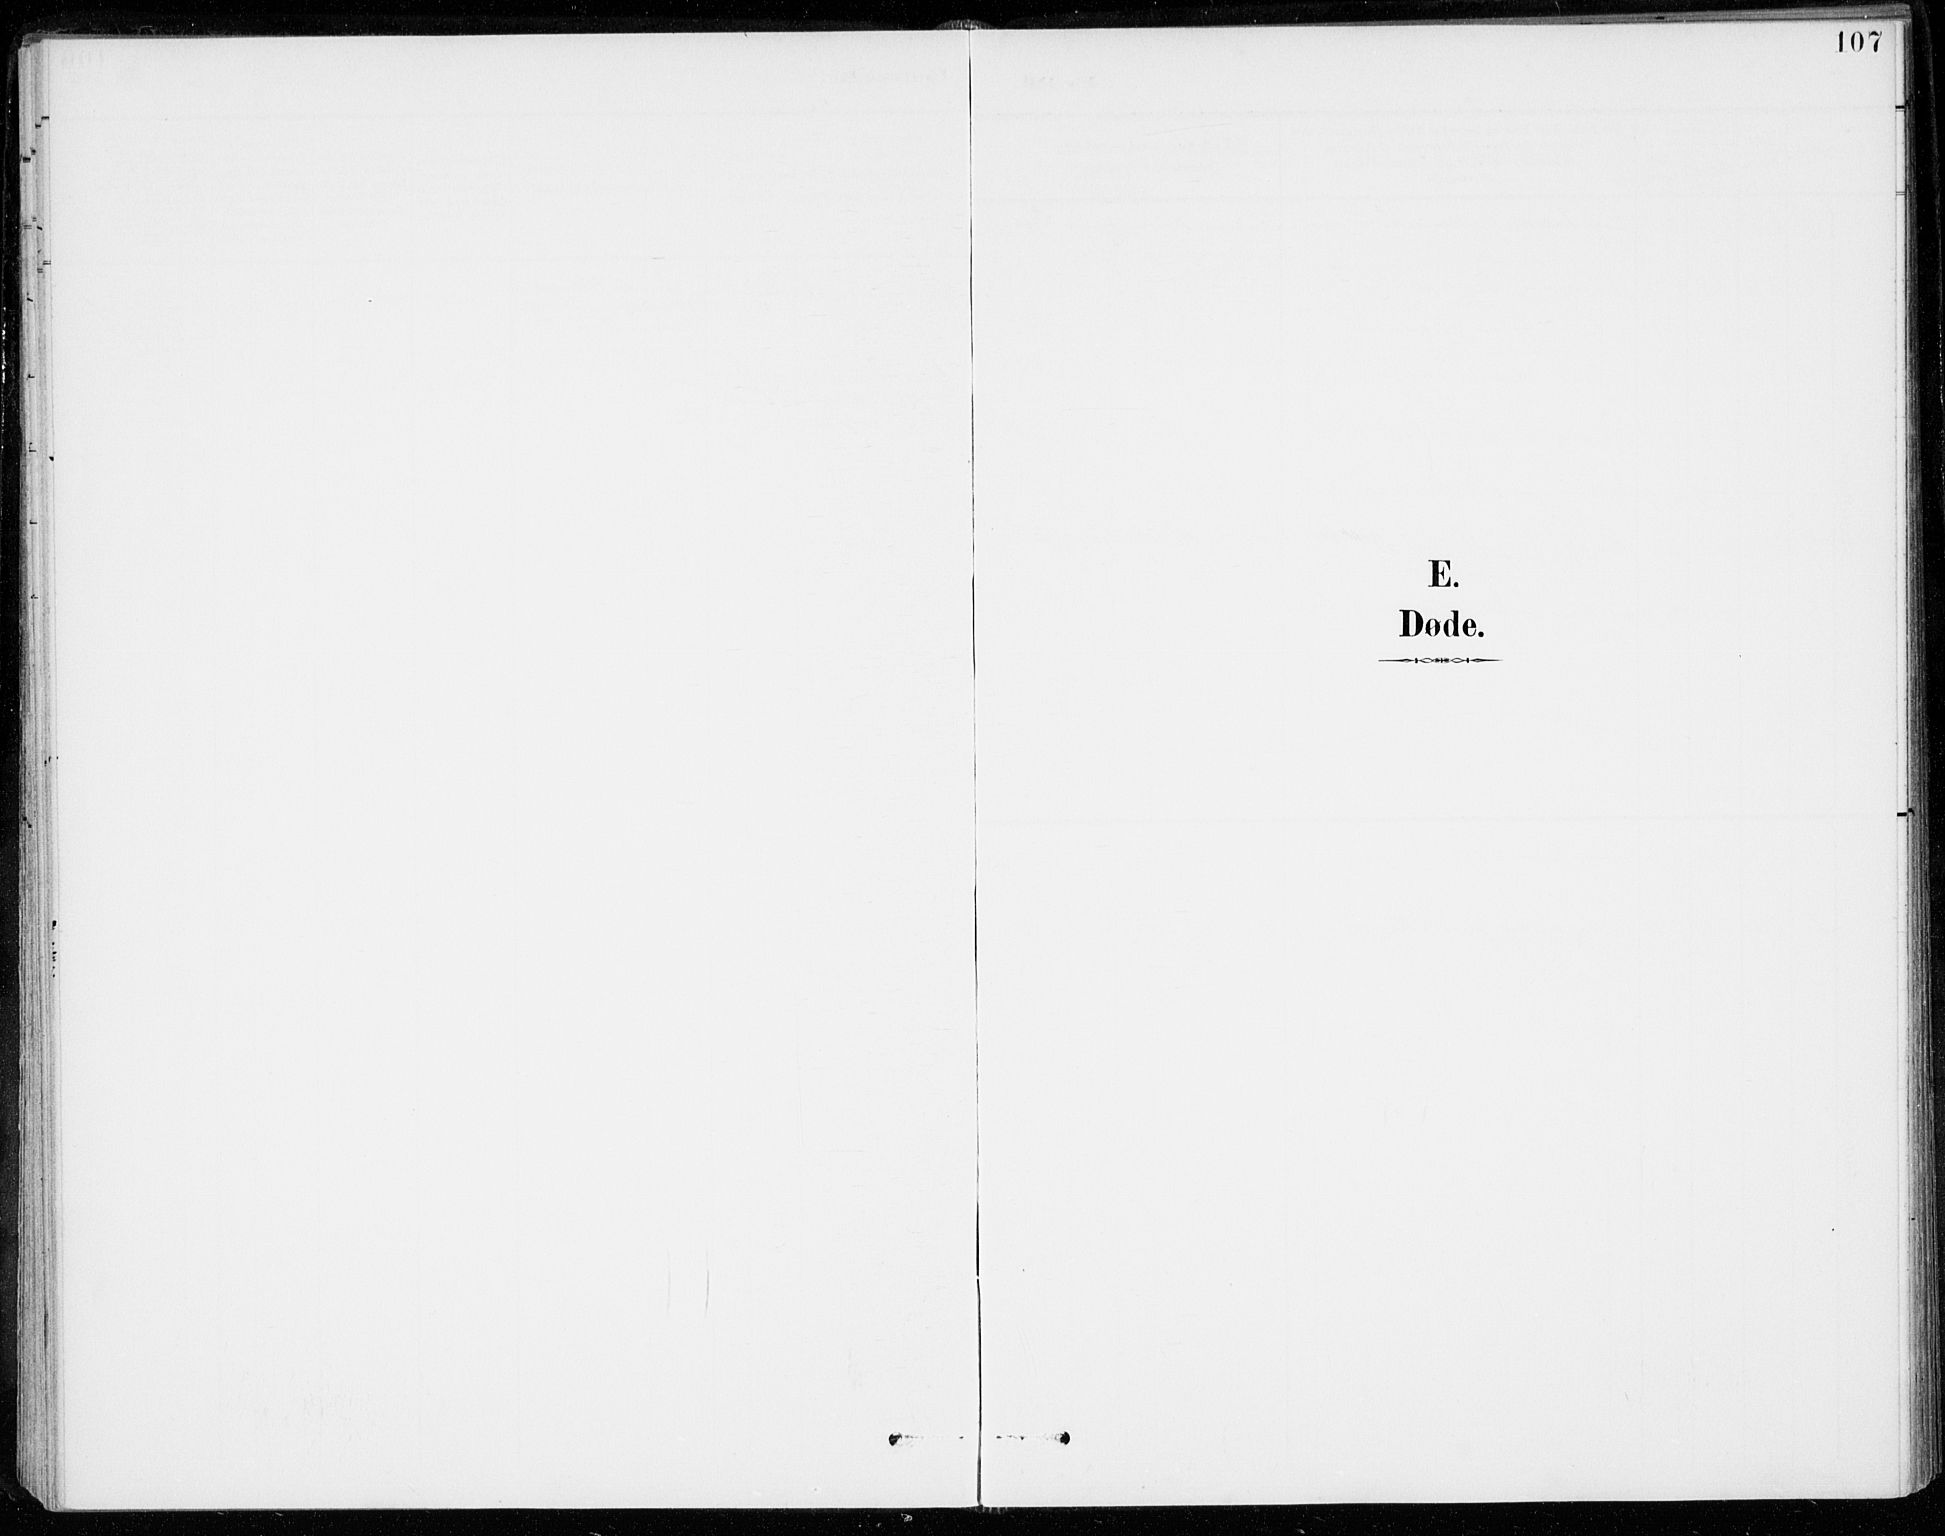 SAKO, Sigdal kirkebøker, F/Fc/L0002: Ministerialbok nr. III 2, 1894-1911, s. 107